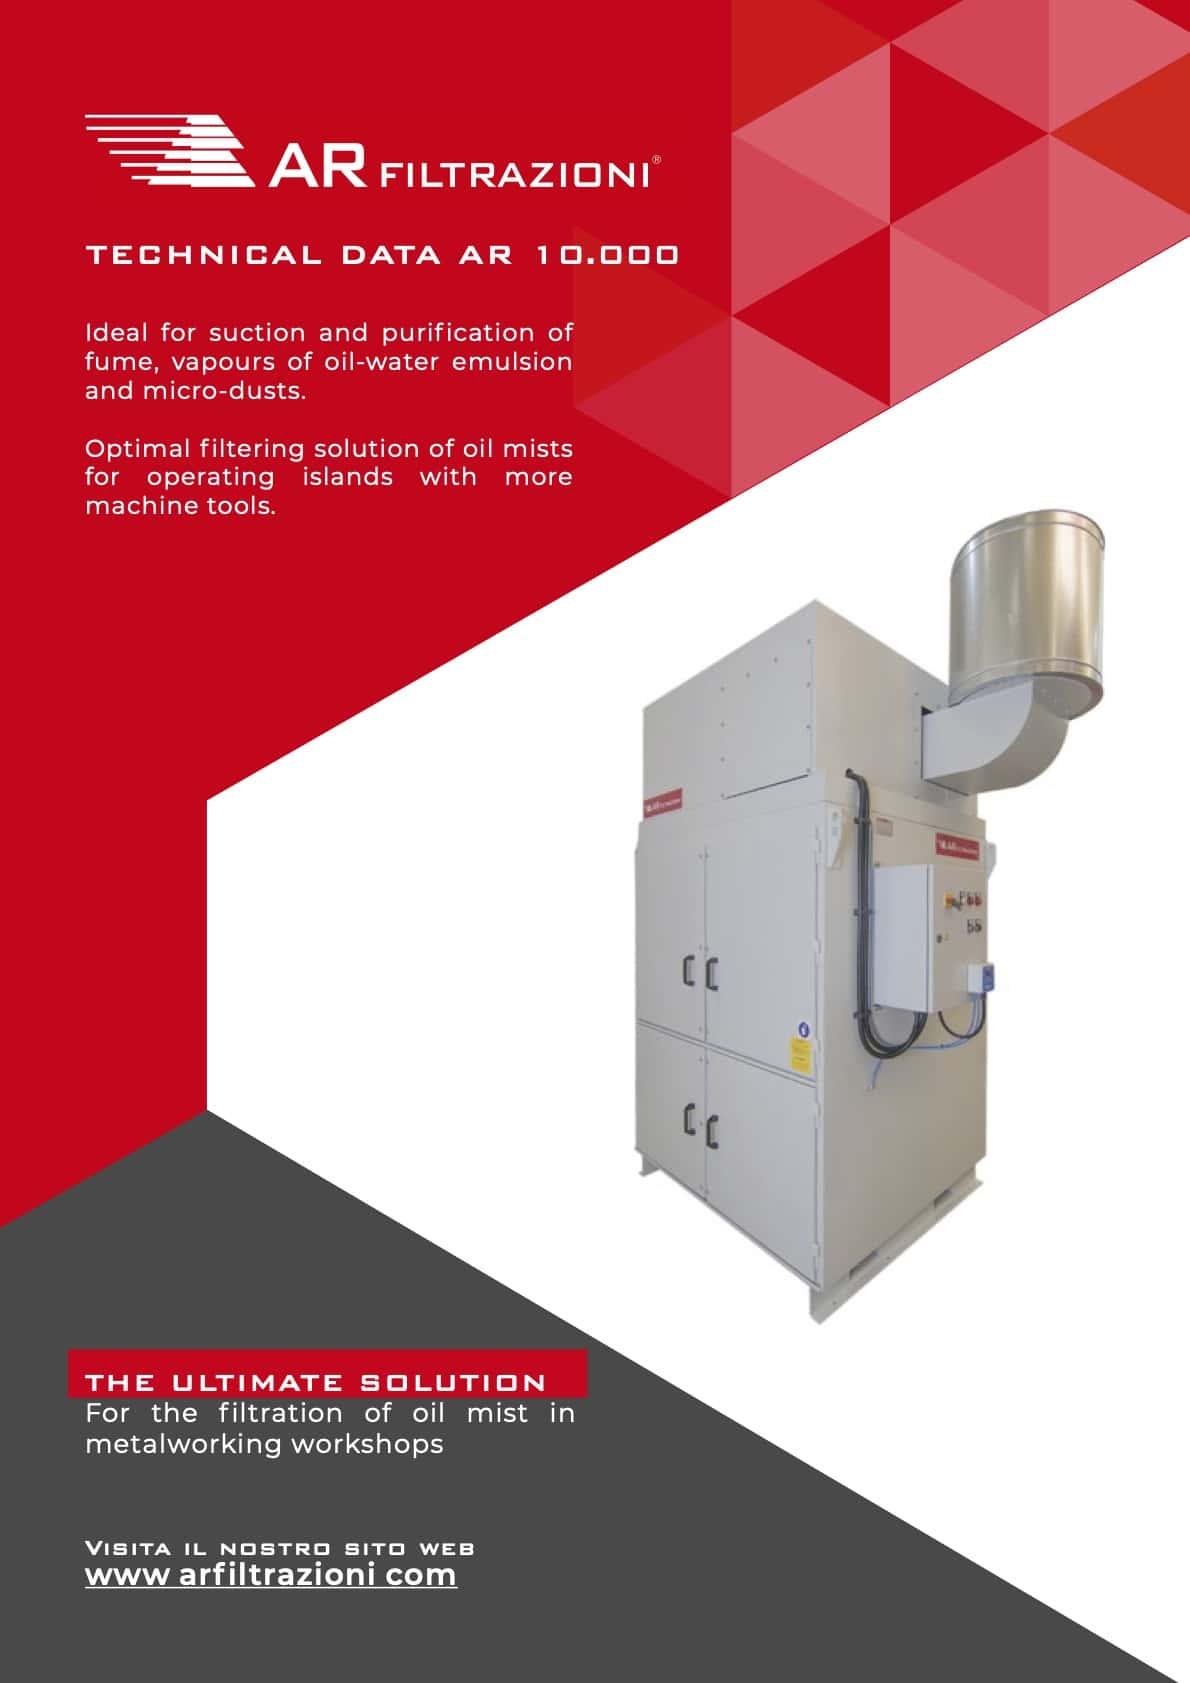 AR Filtrazioni Case History Portfolio Filtrazione Nebbie Oleose AR1000 – Suction and purification of oil mist produced during wet machining processes